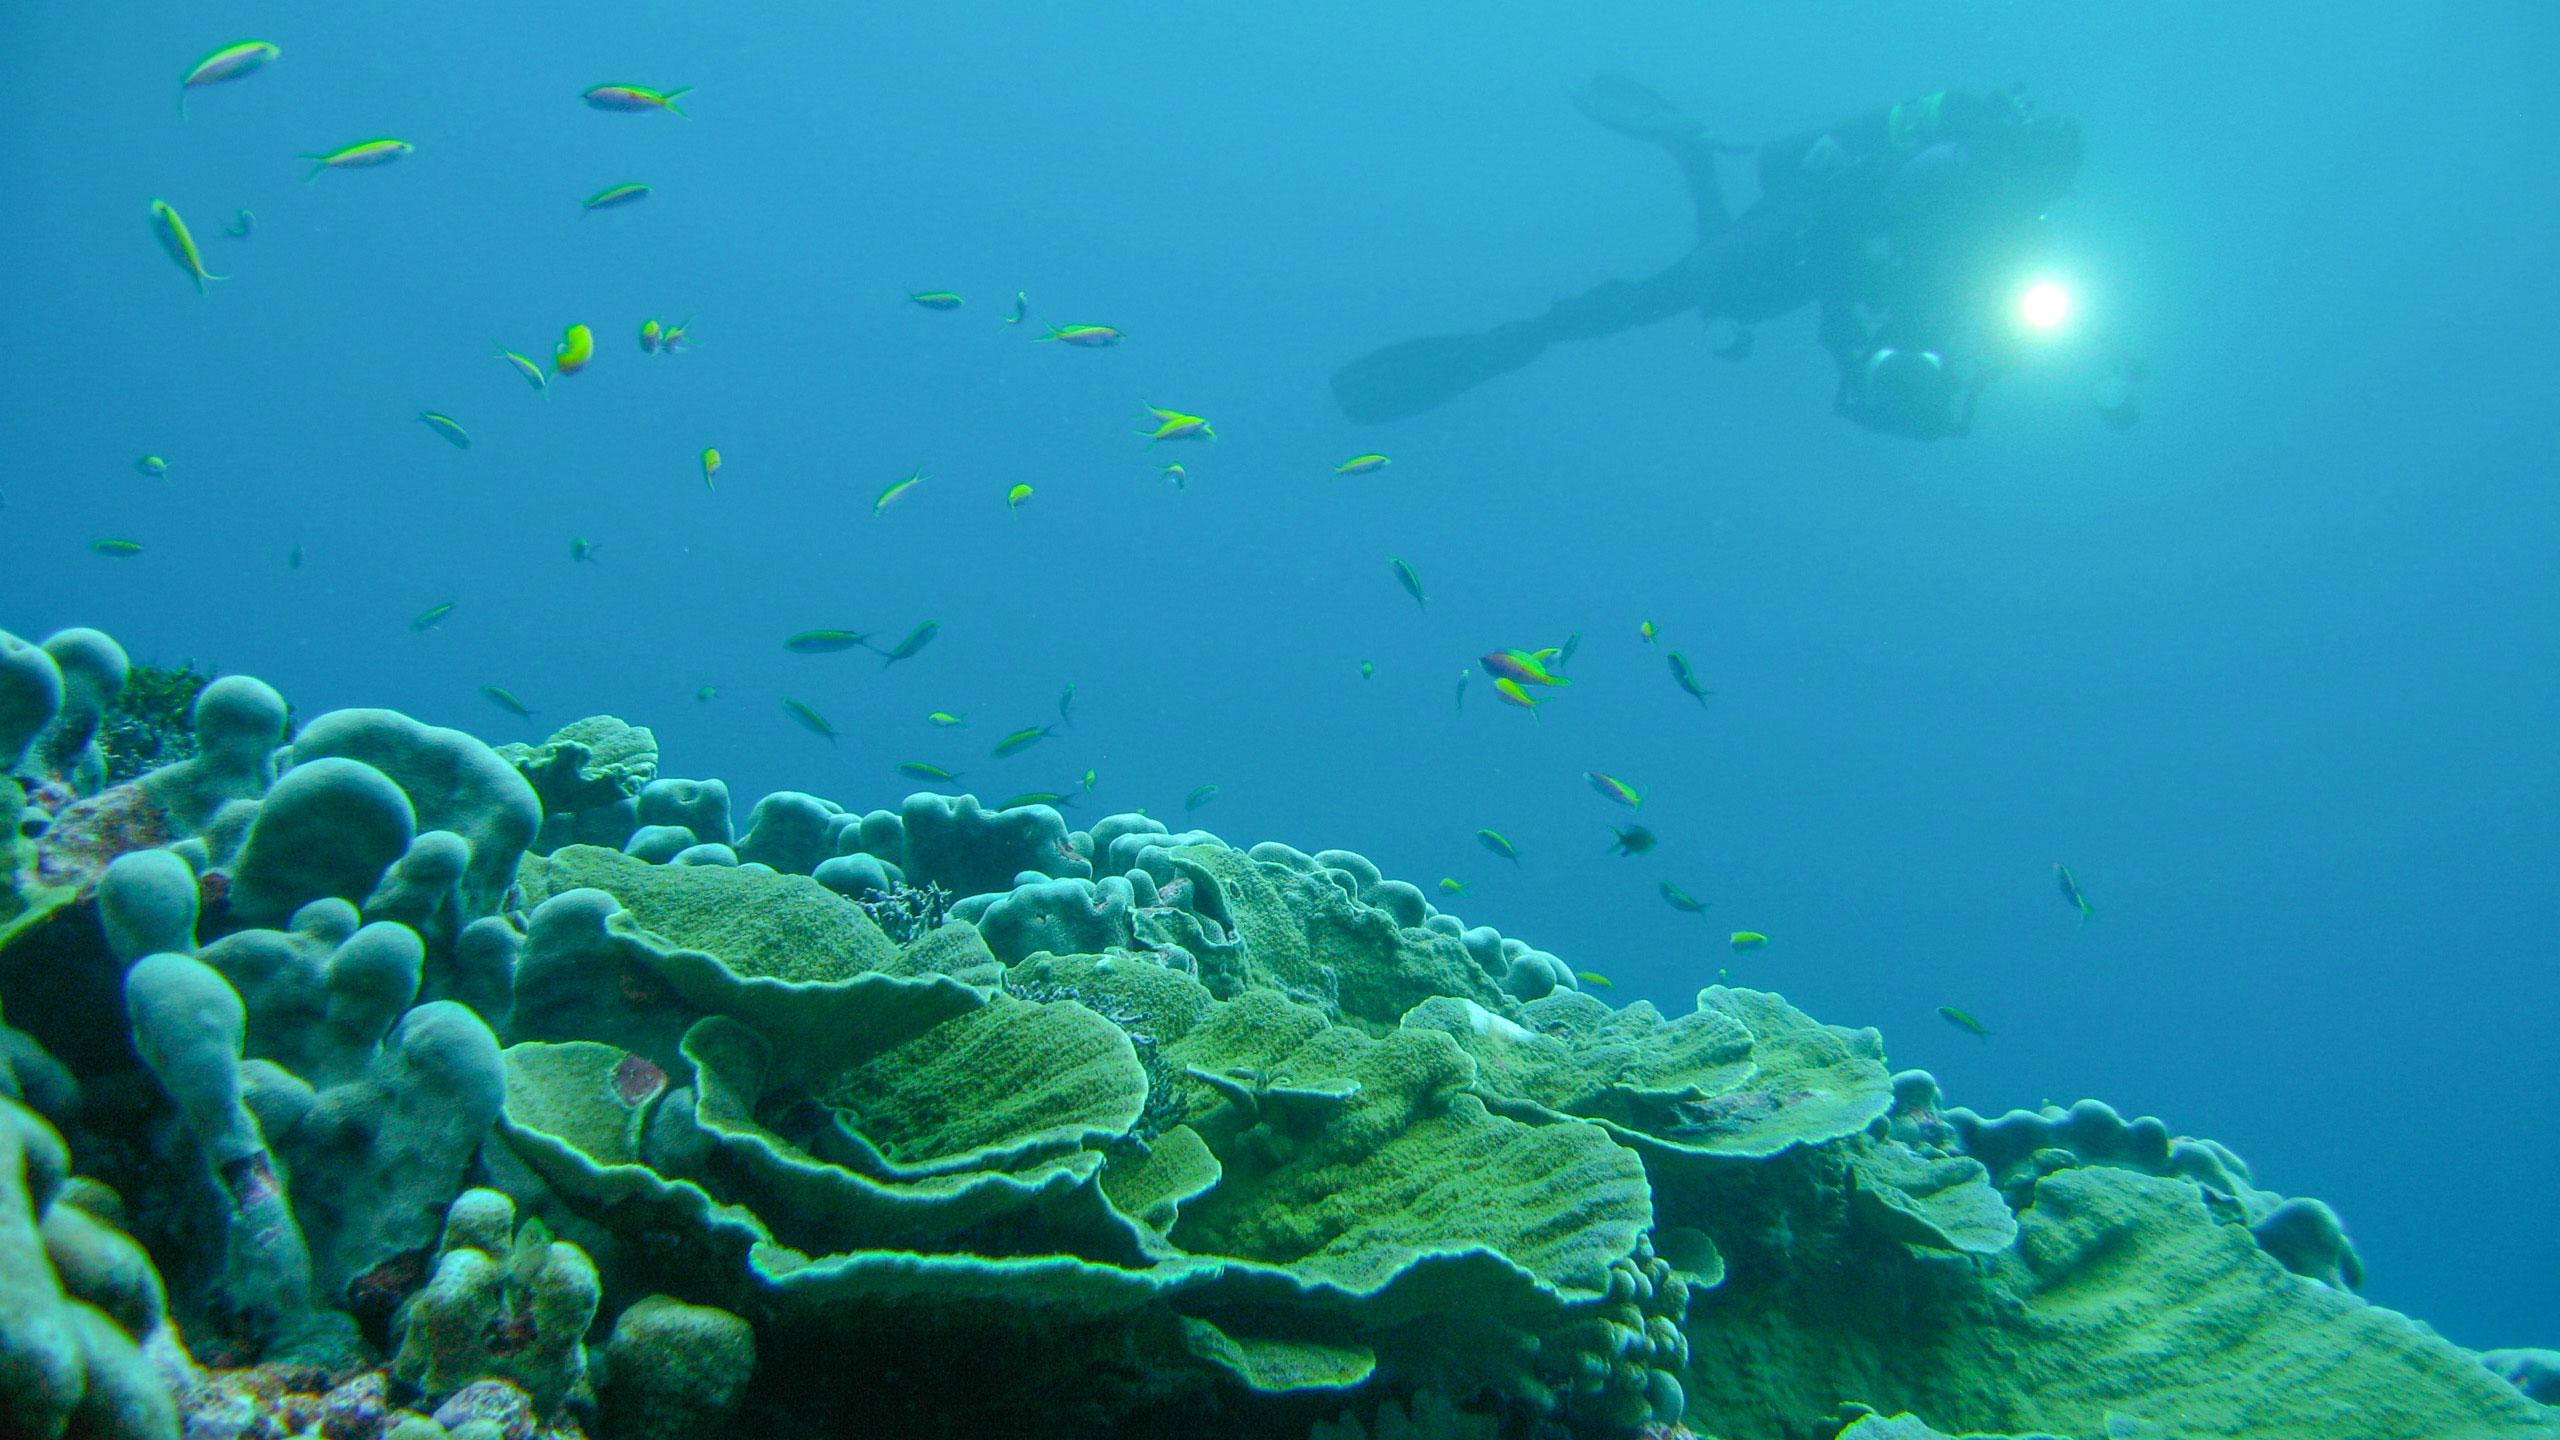 Diver and coral reef in Millennium Atoll, Kiribati, Micronesia